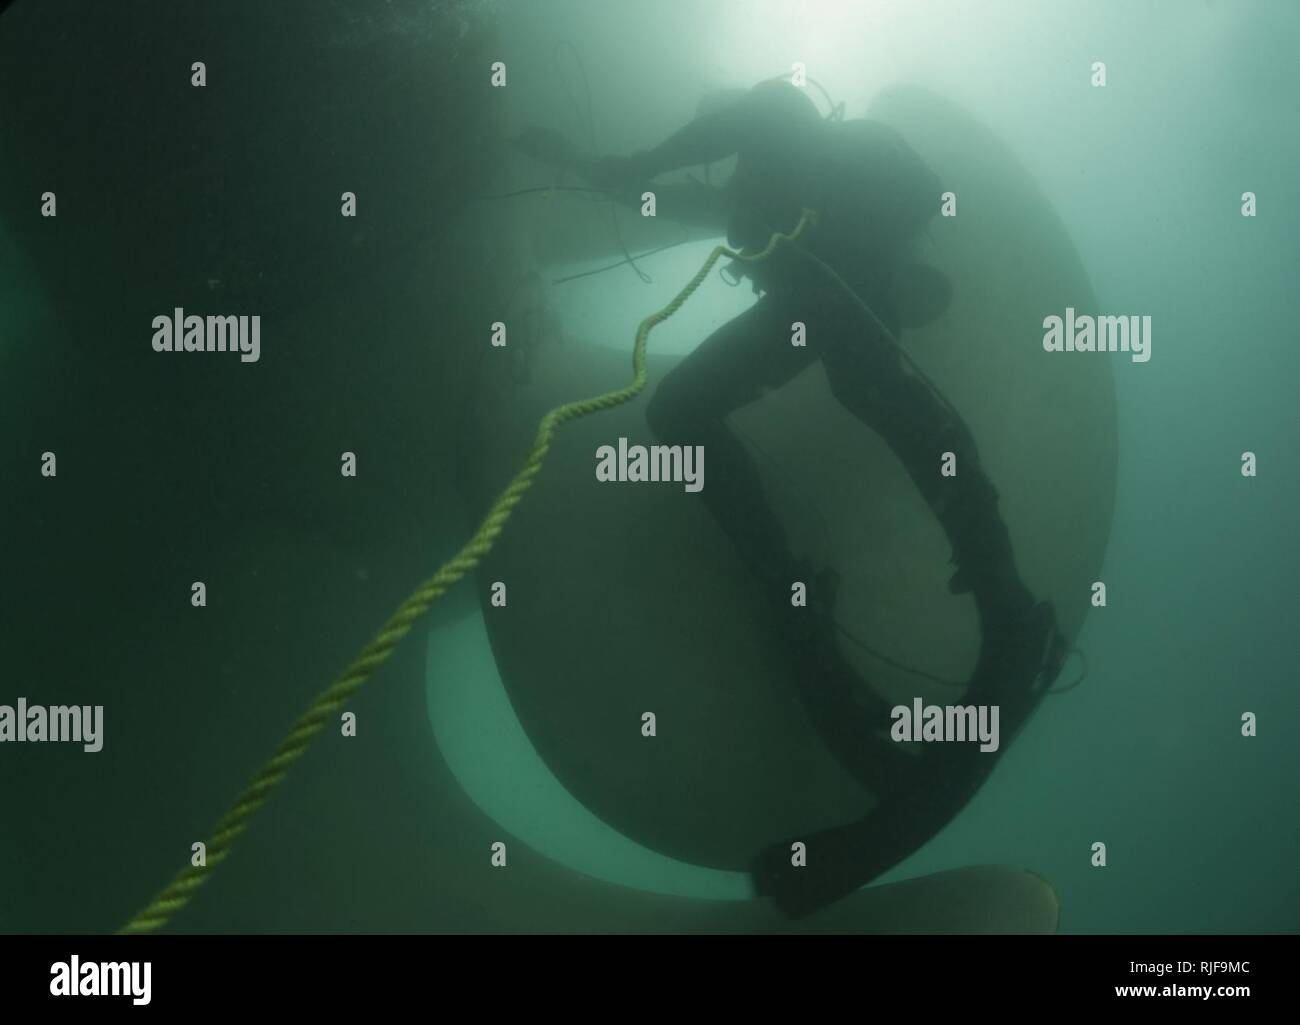 MINA SALMAN PIER, Bahrain (Feb  18, 2013) Navy Diver 1st